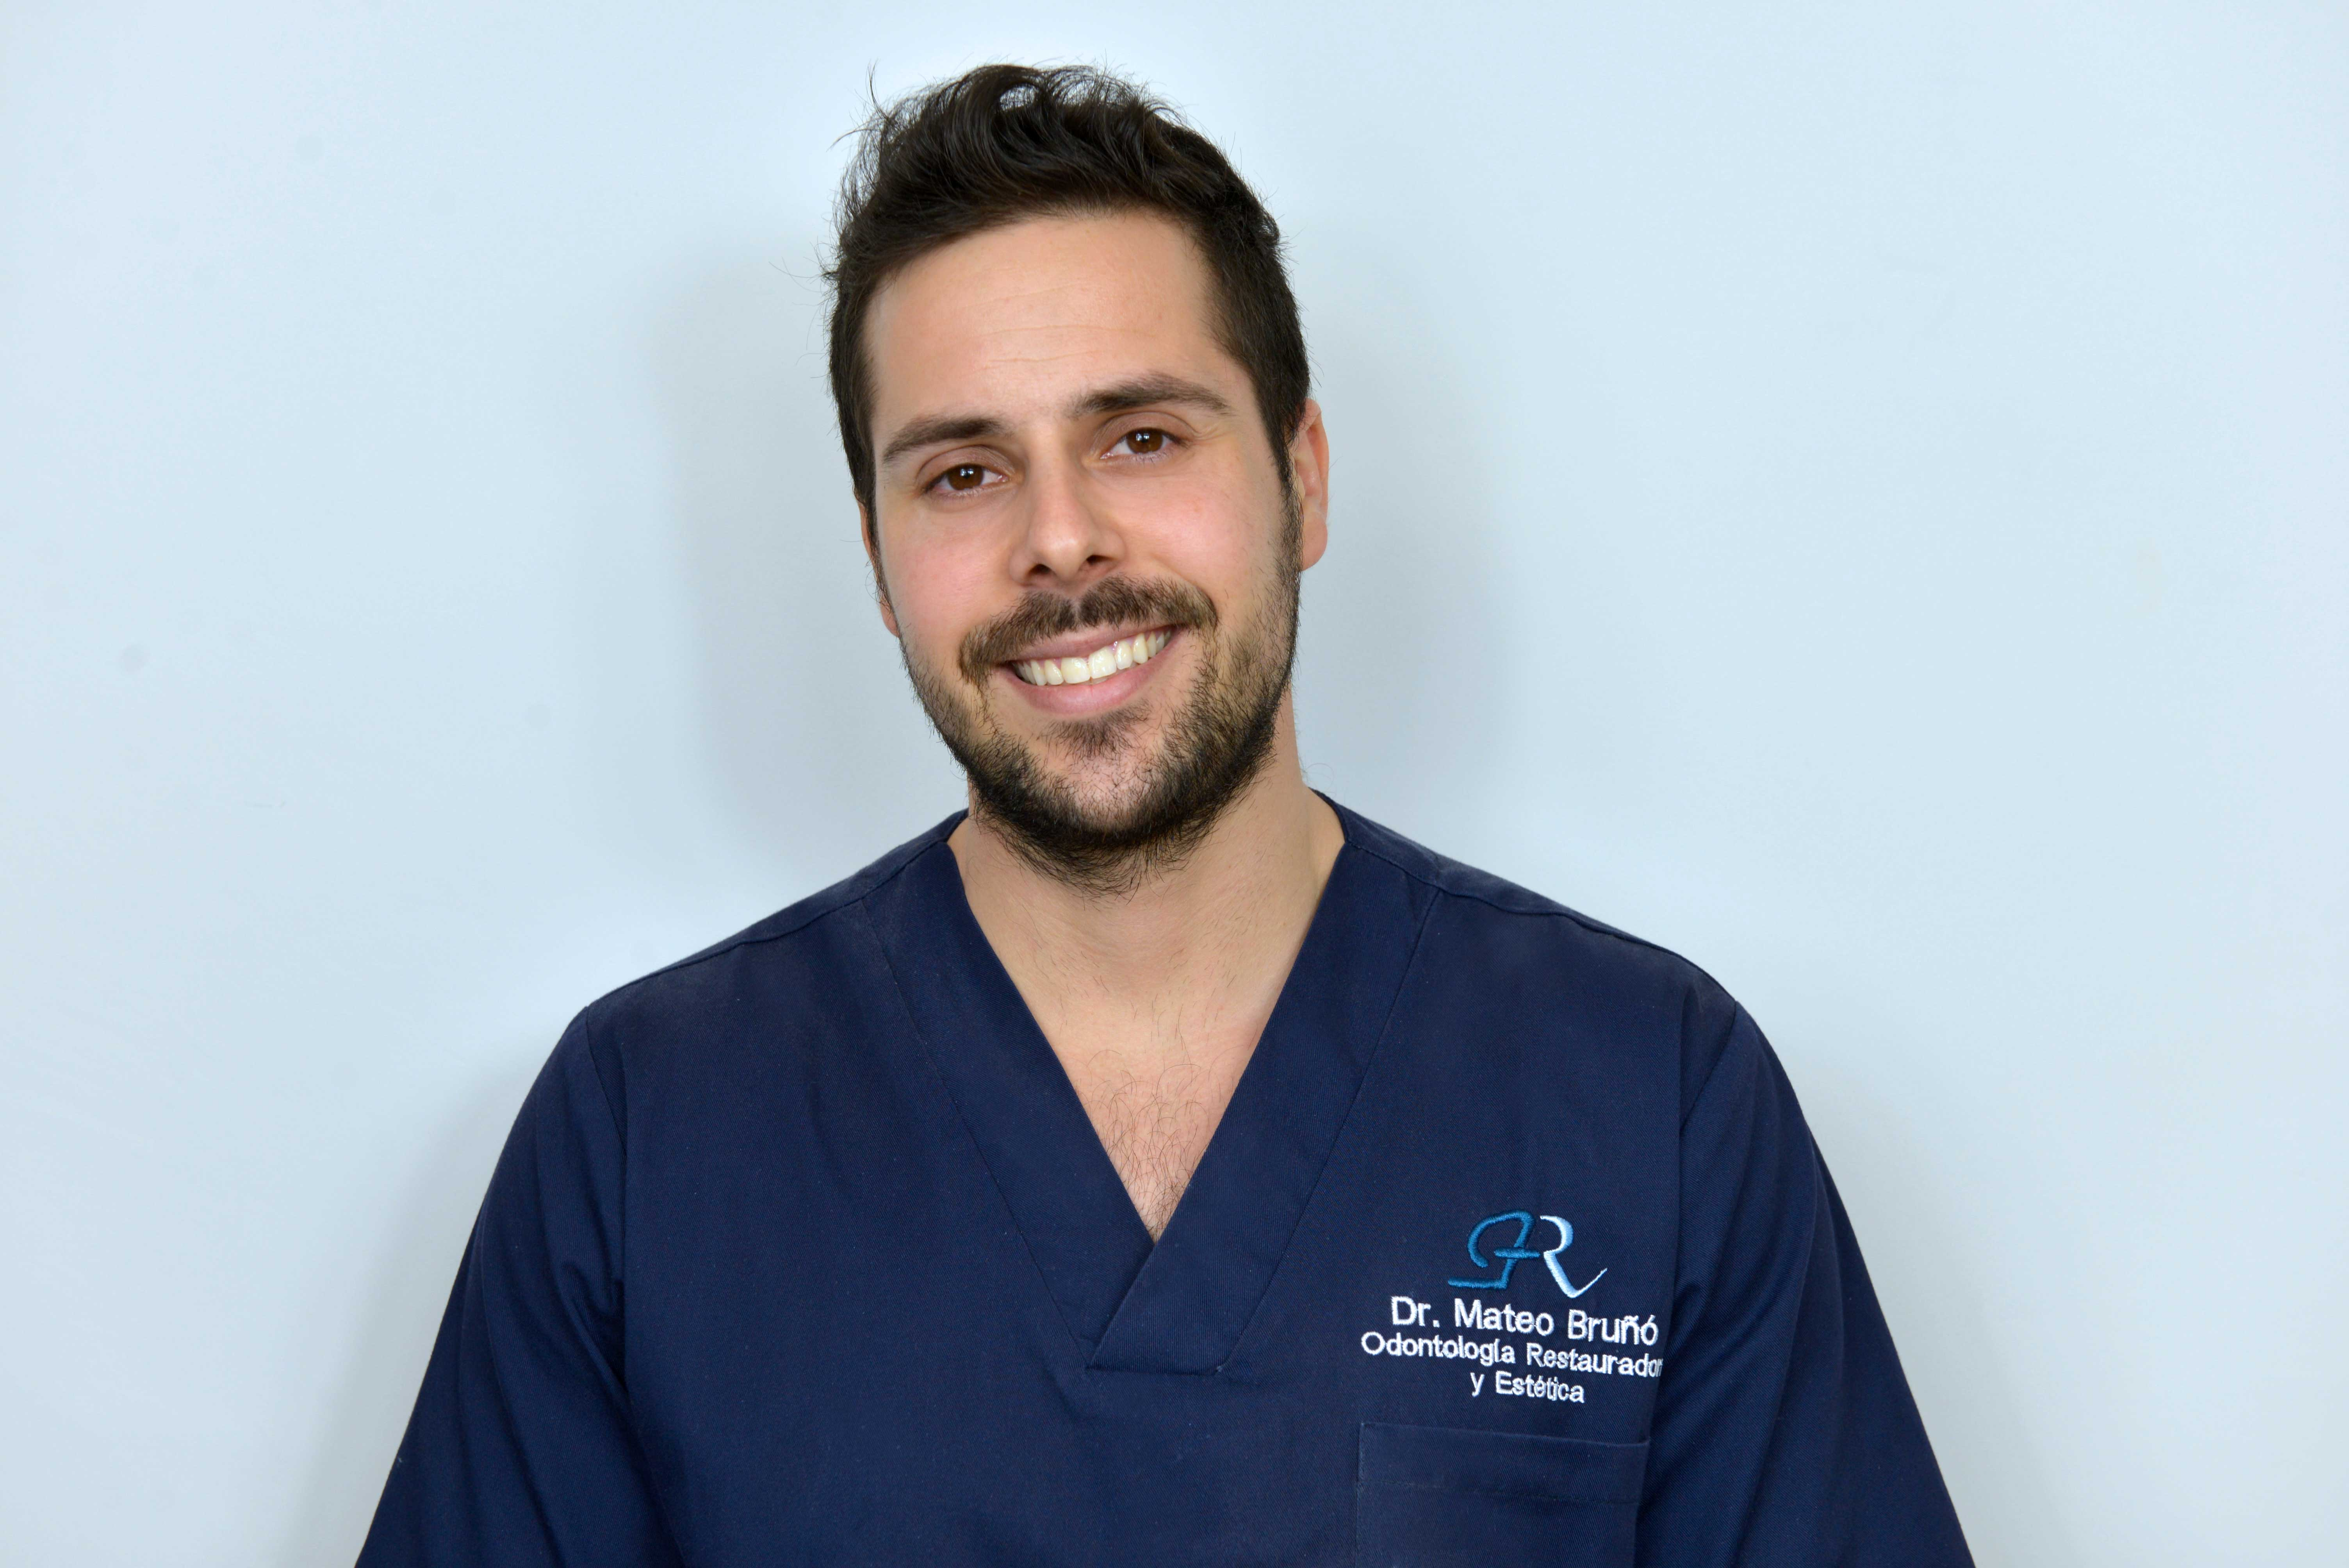 Dr. Mateo Bruñó